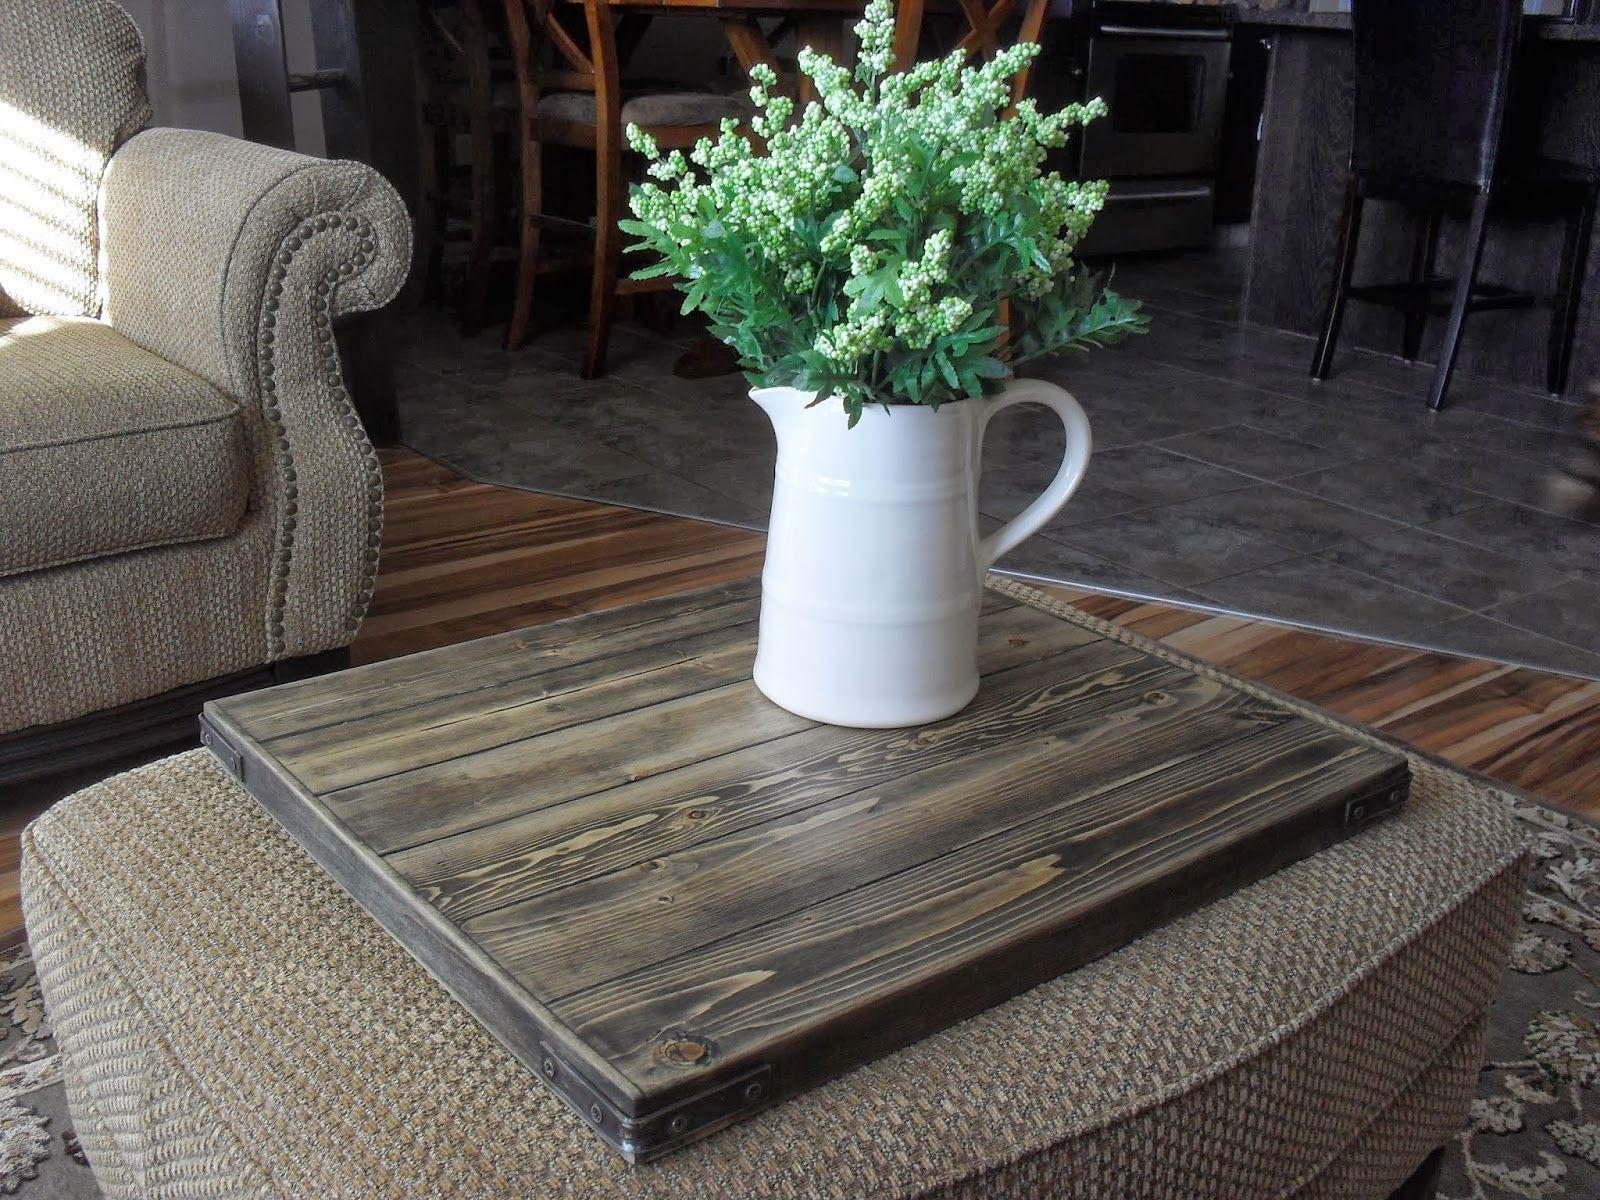 Miraculous Ottoman Topper Anniversaries Diy Home Crafts Wood Tray Frankydiablos Diy Chair Ideas Frankydiabloscom